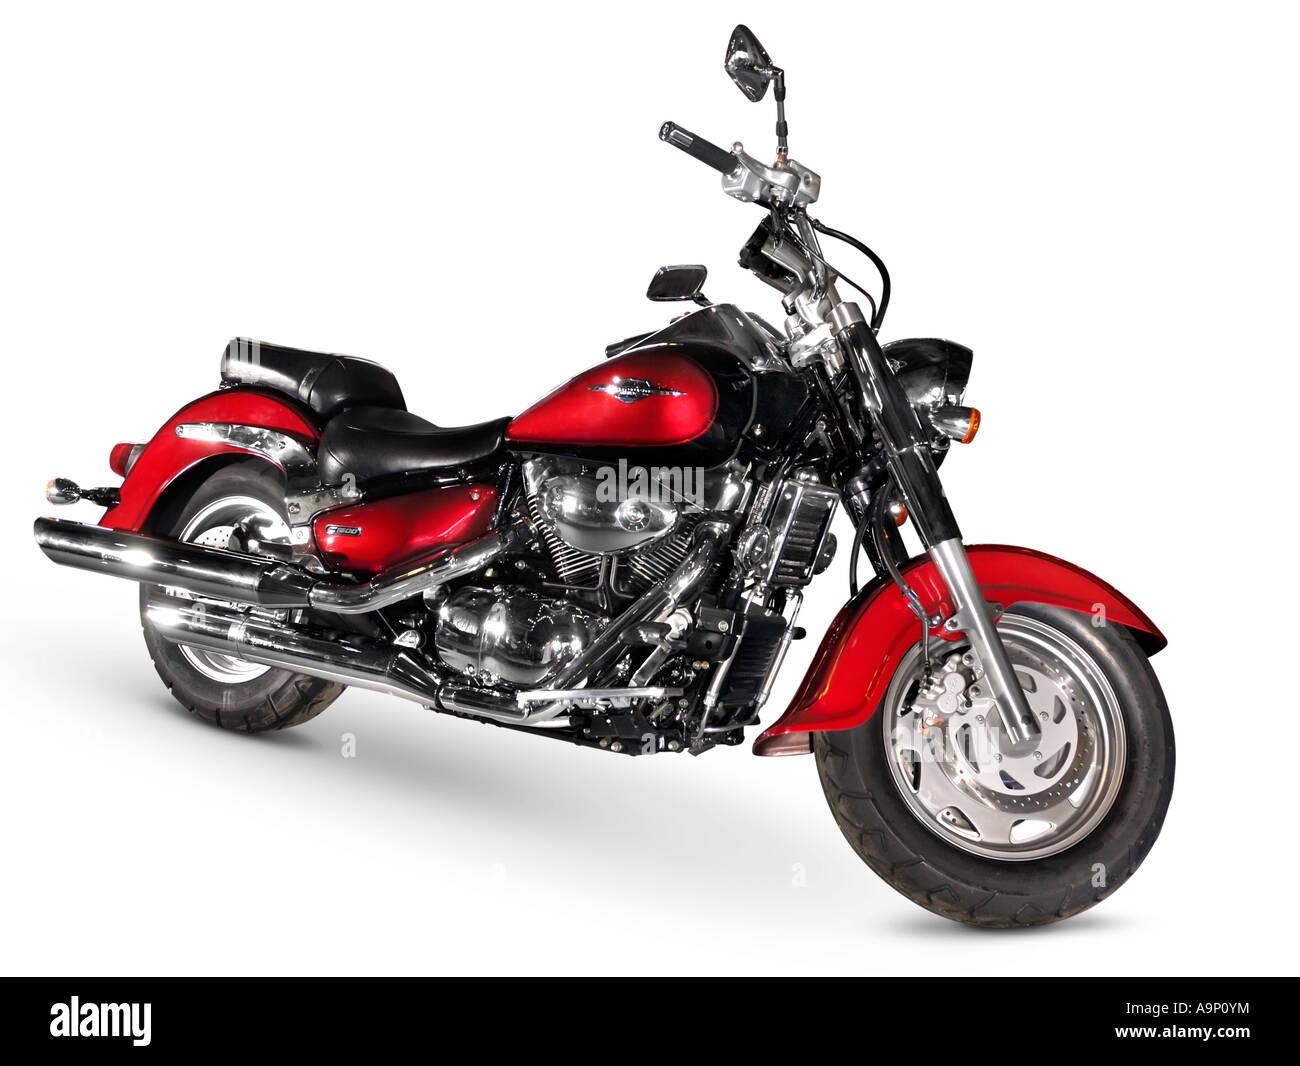 Red motorbike - Stock Image